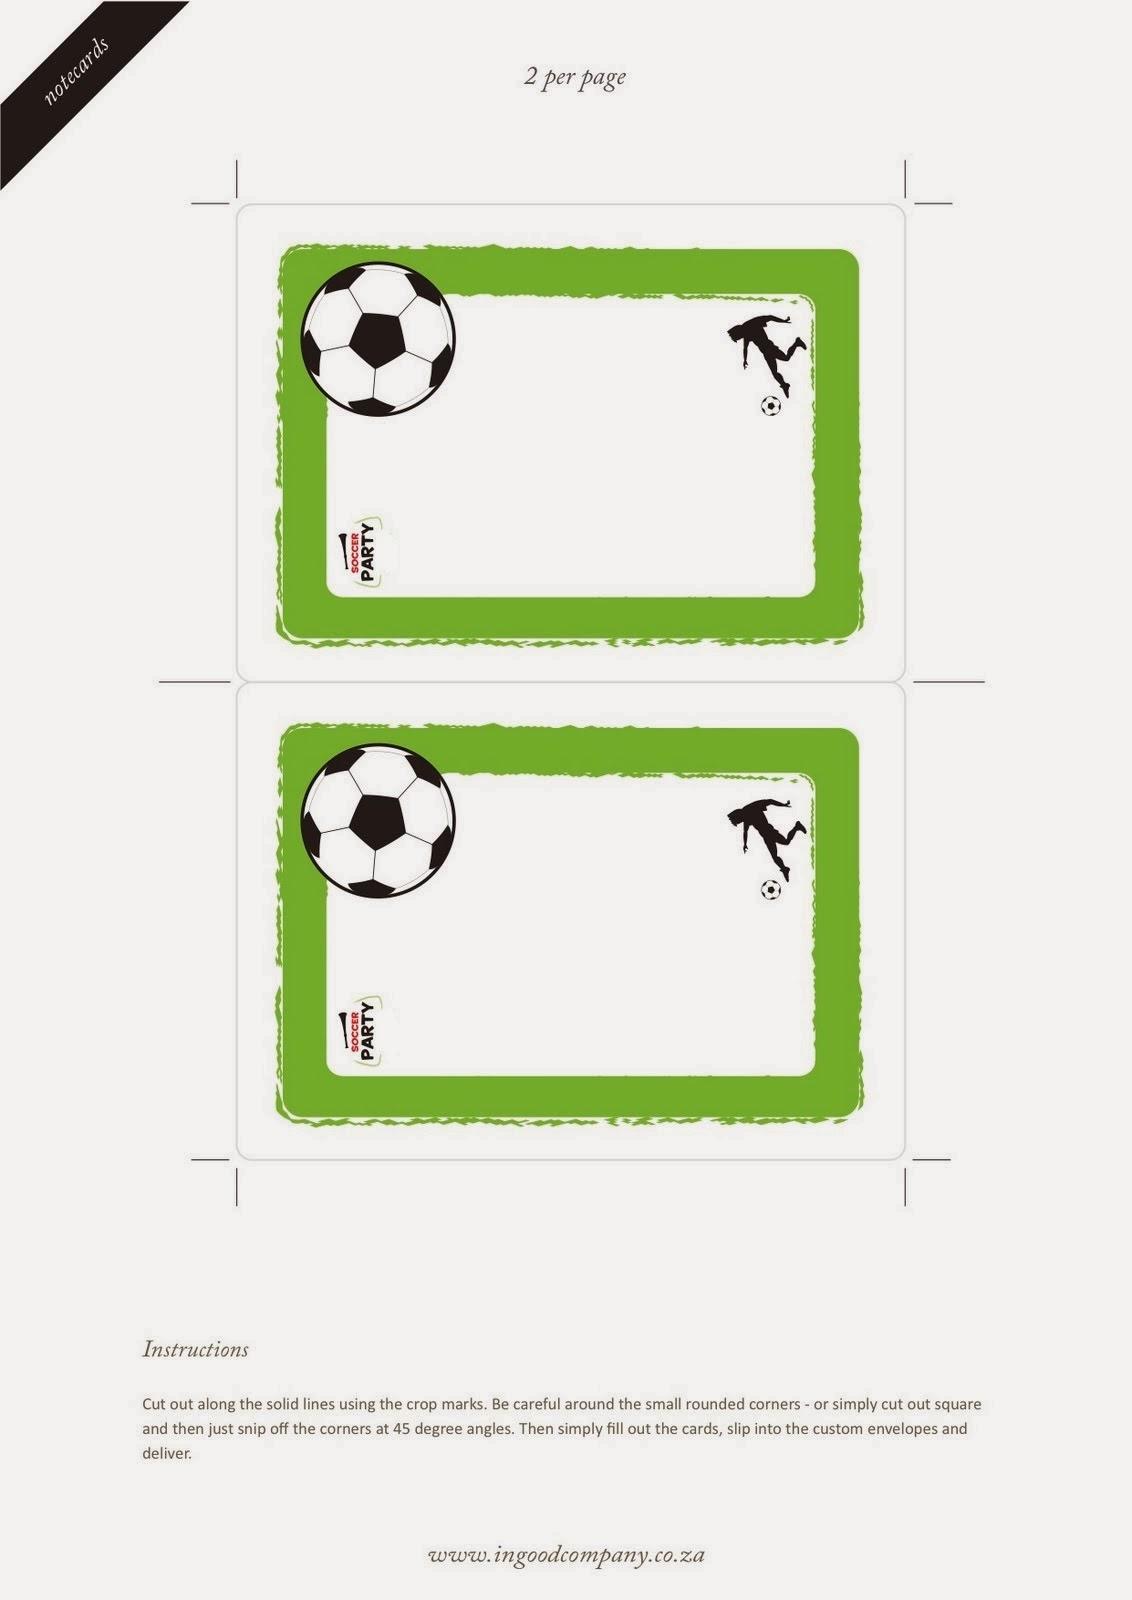 Imagenes De Pelotas De Futbol Para Imprimir - Plantilla DE Pelota DE Fútbol Para Imprimir ClipartLogo